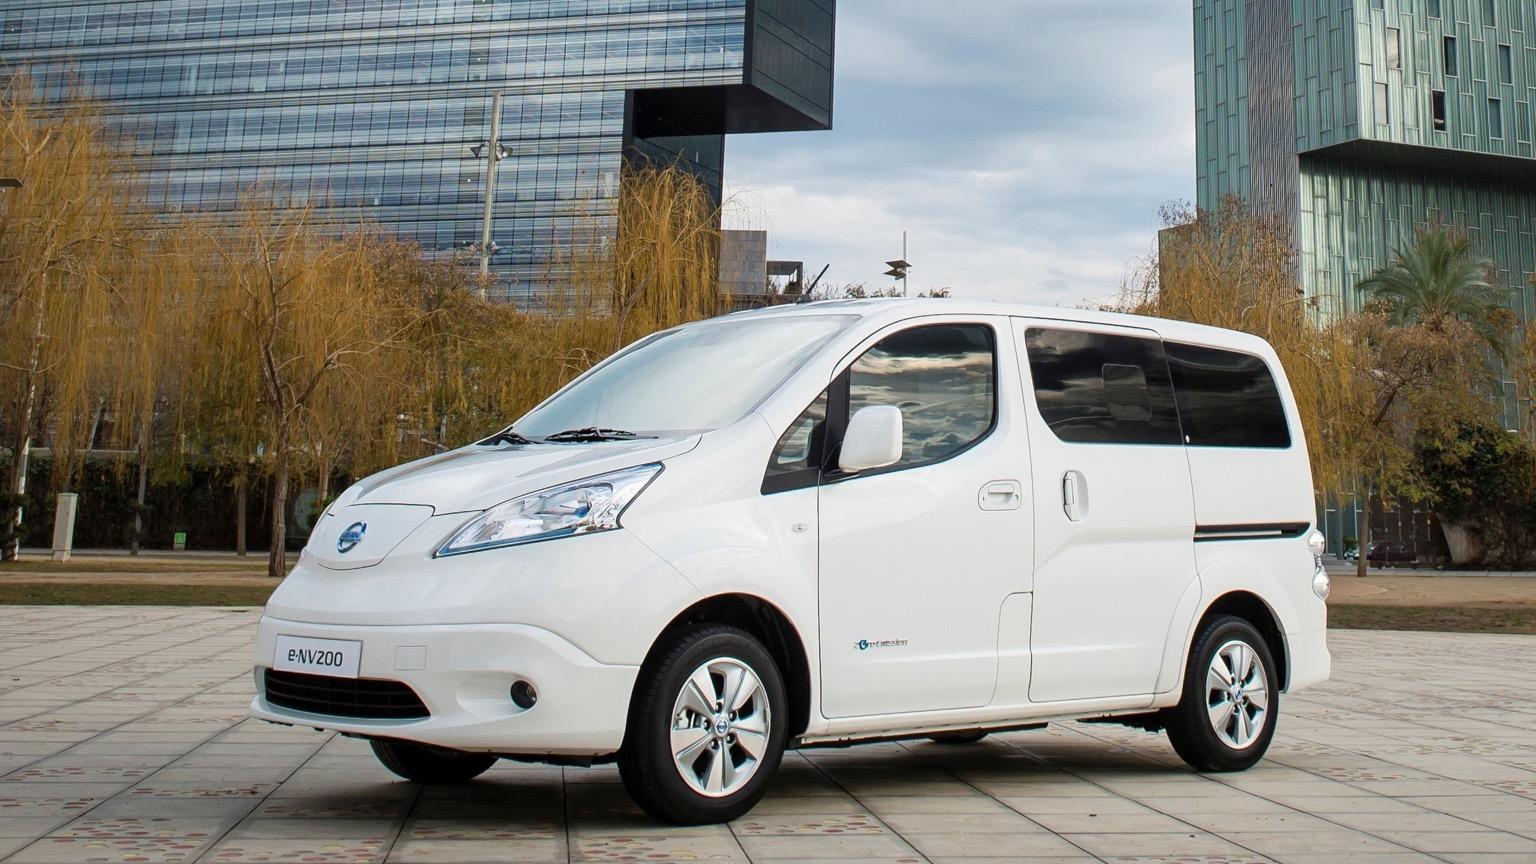 Nissan e-NV200 Evalia 38 kWh